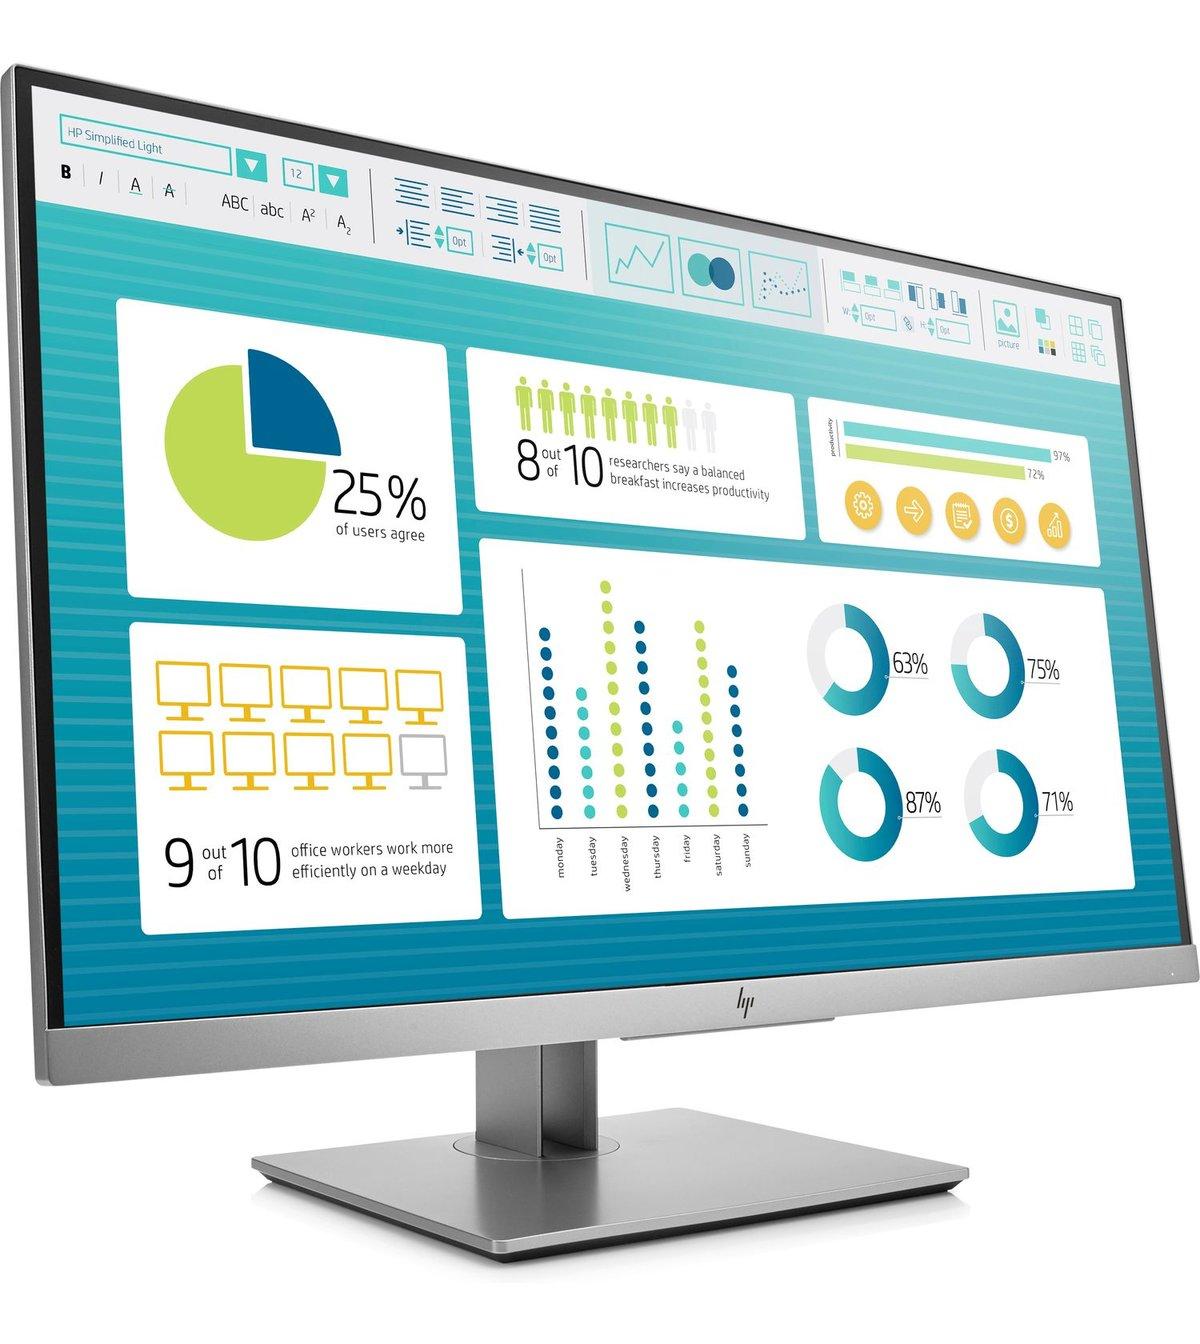 slide 2 of 5,show larger image, hp elitedisplay e273 27-inch monitor head only